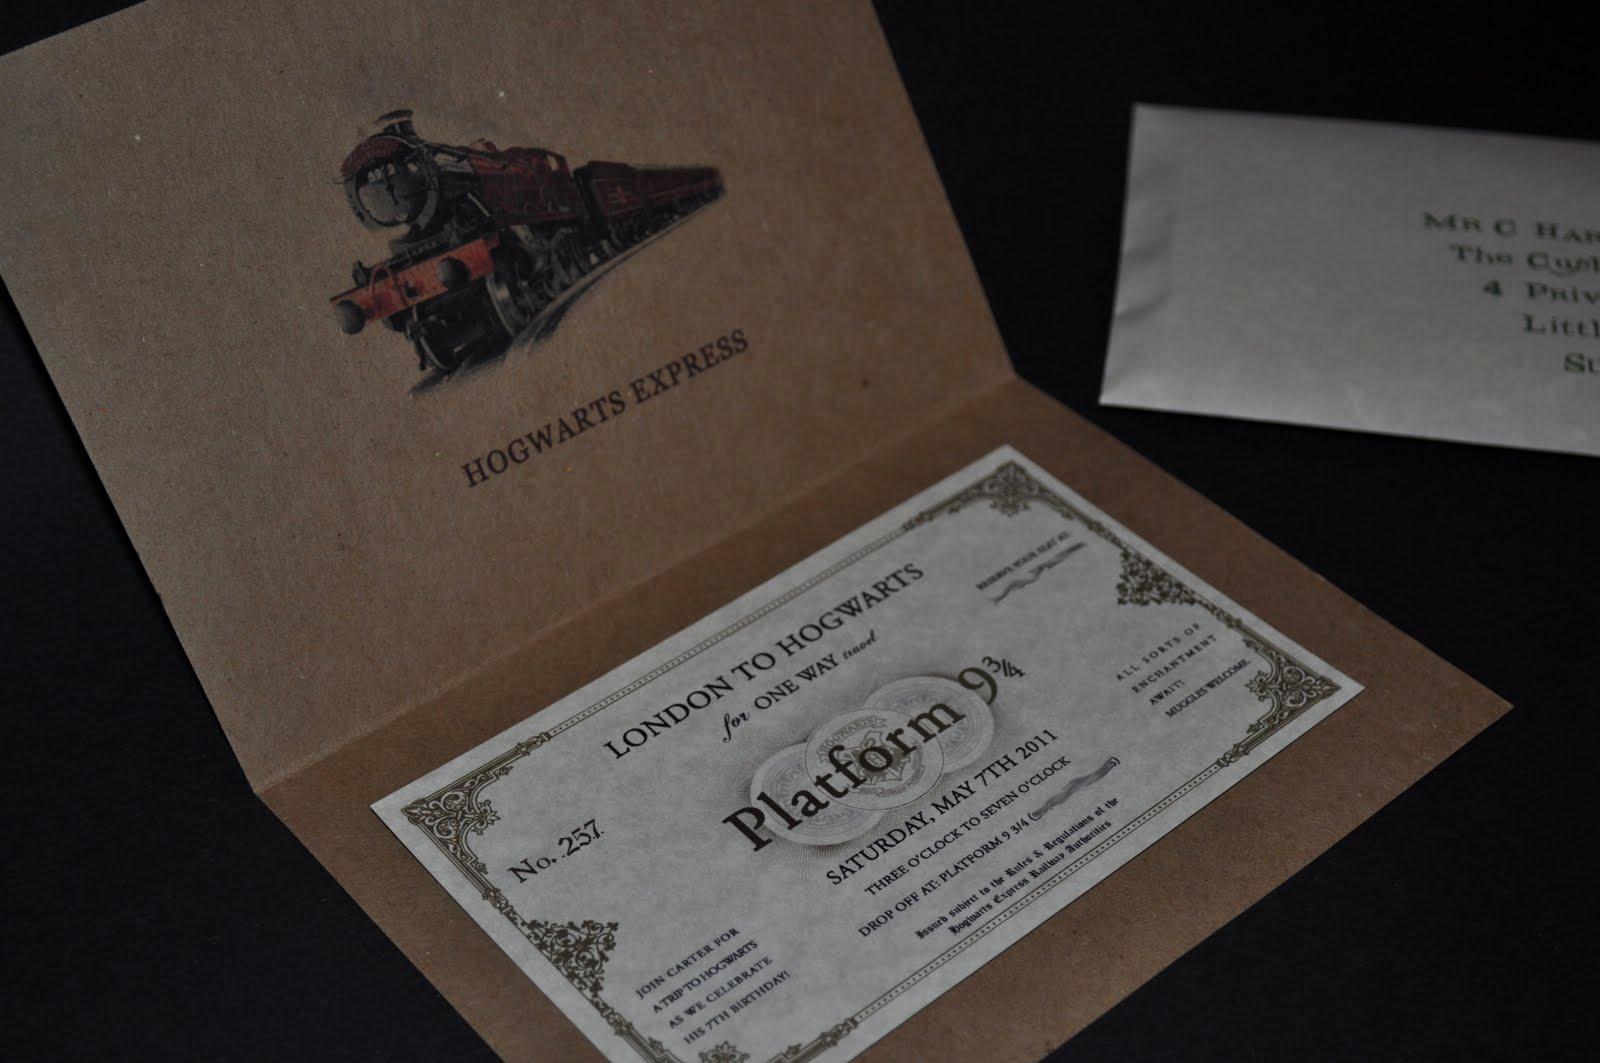 Harry Potter Birthday Party Invitation Unique Serendipity Design Studio Sneak Peek the Final